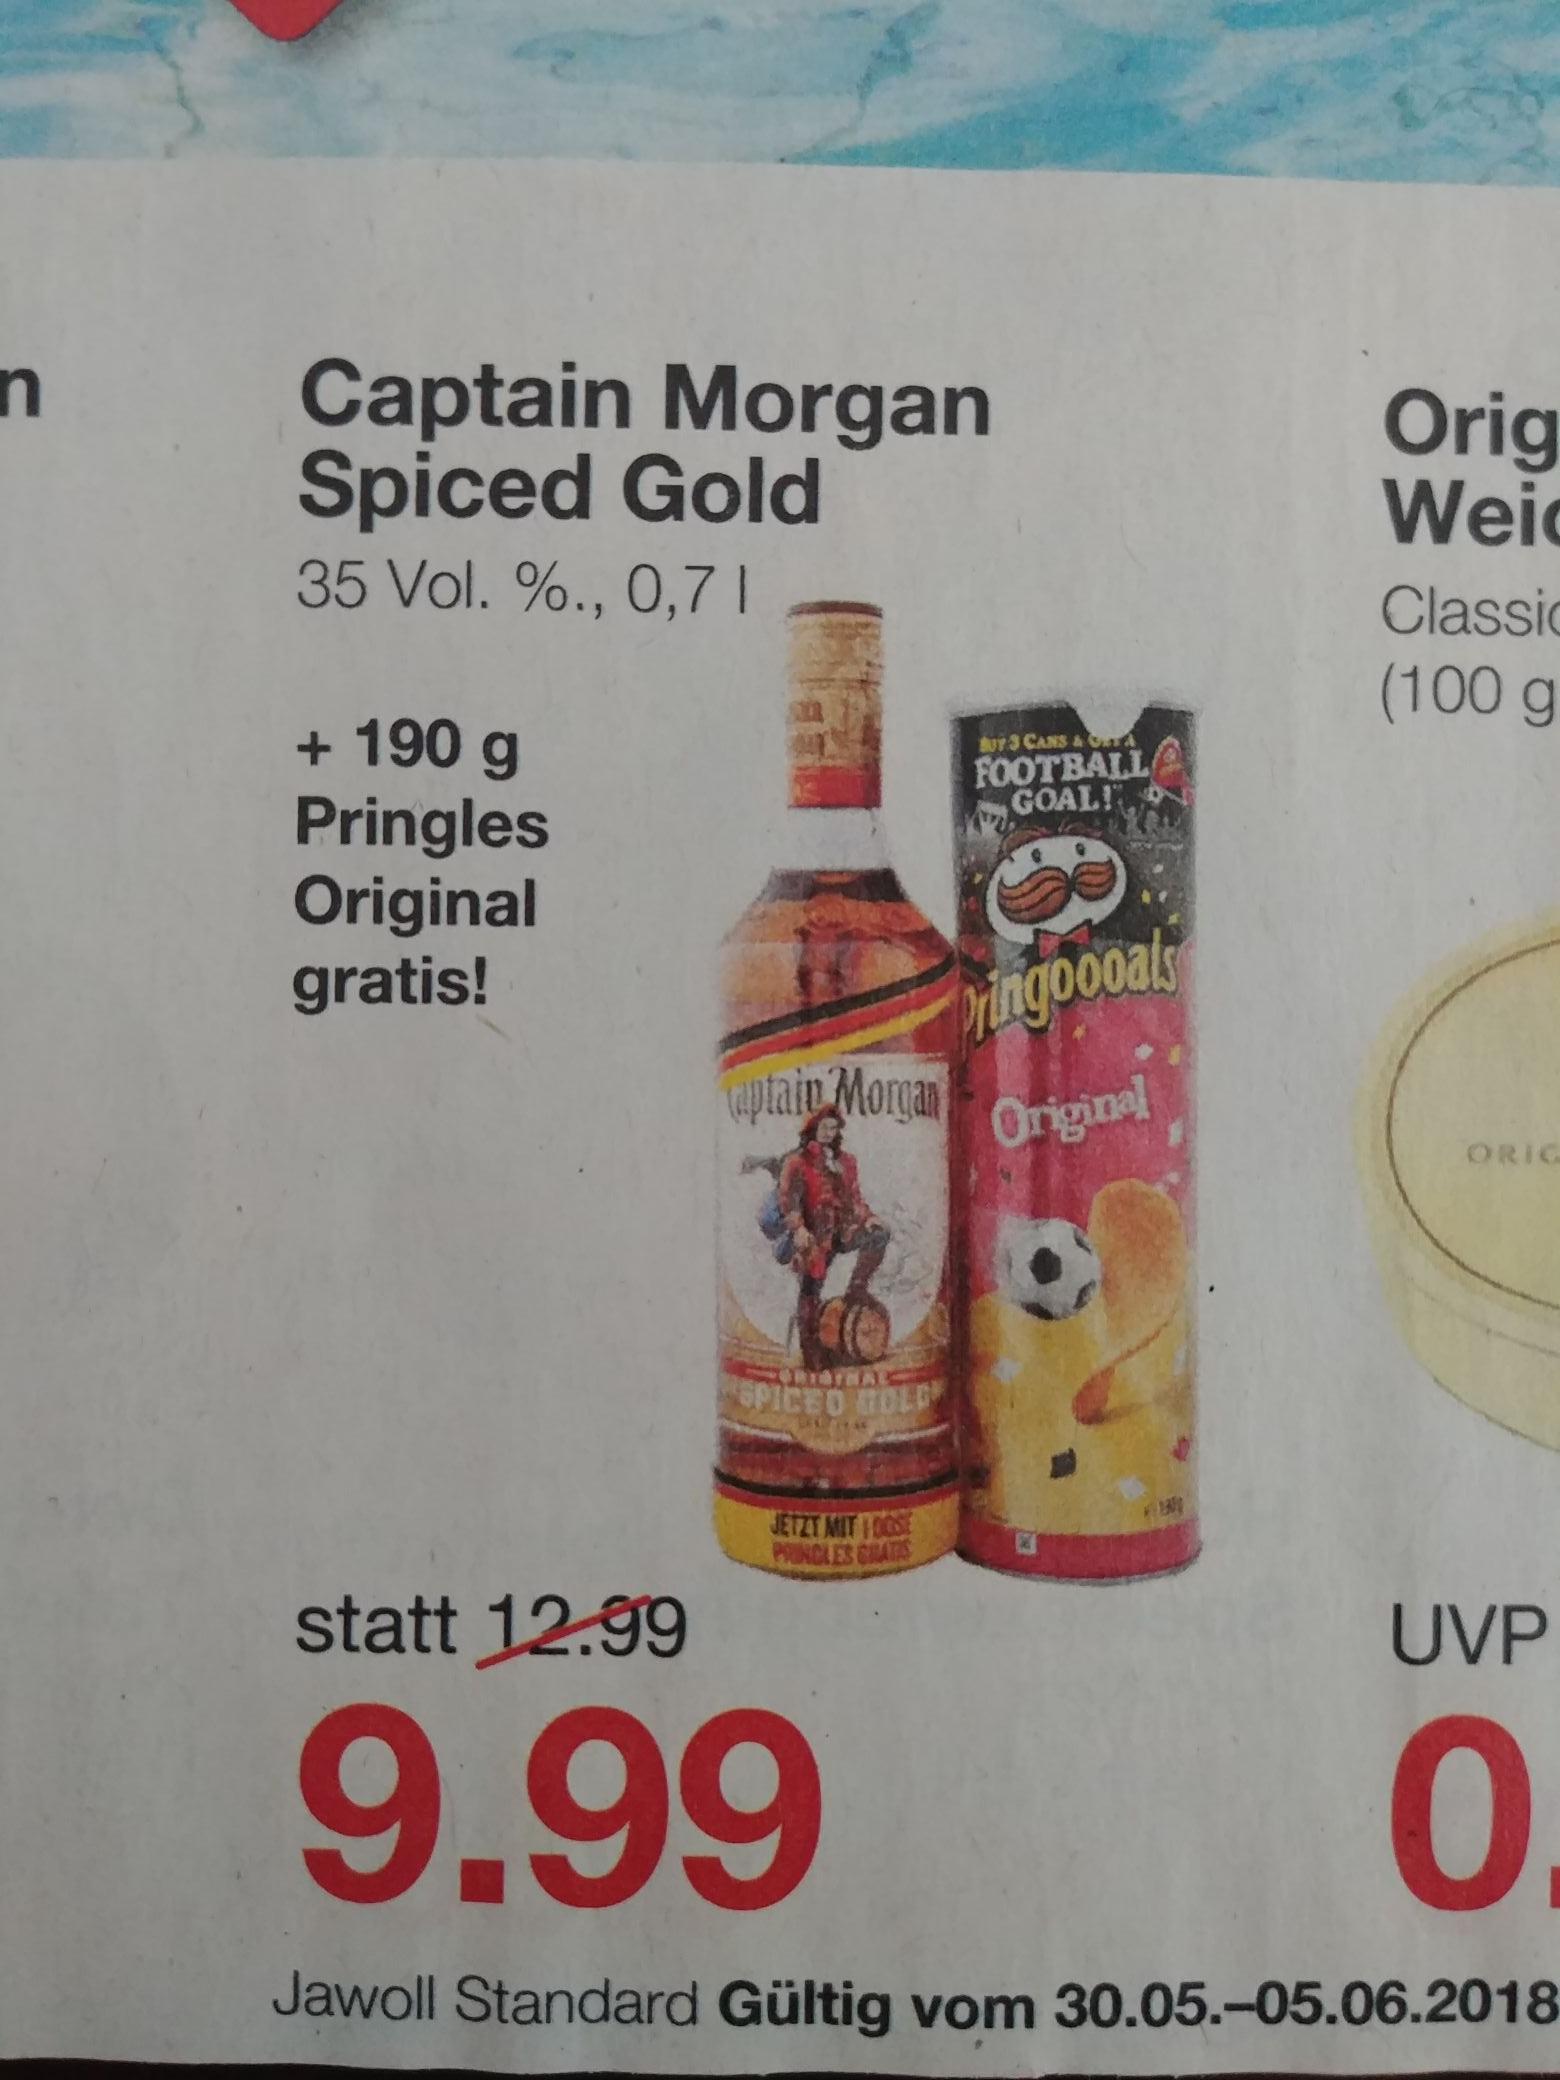 [Lokal] Jawoll Captain Morgan 0,7l + Original Pringles 190g